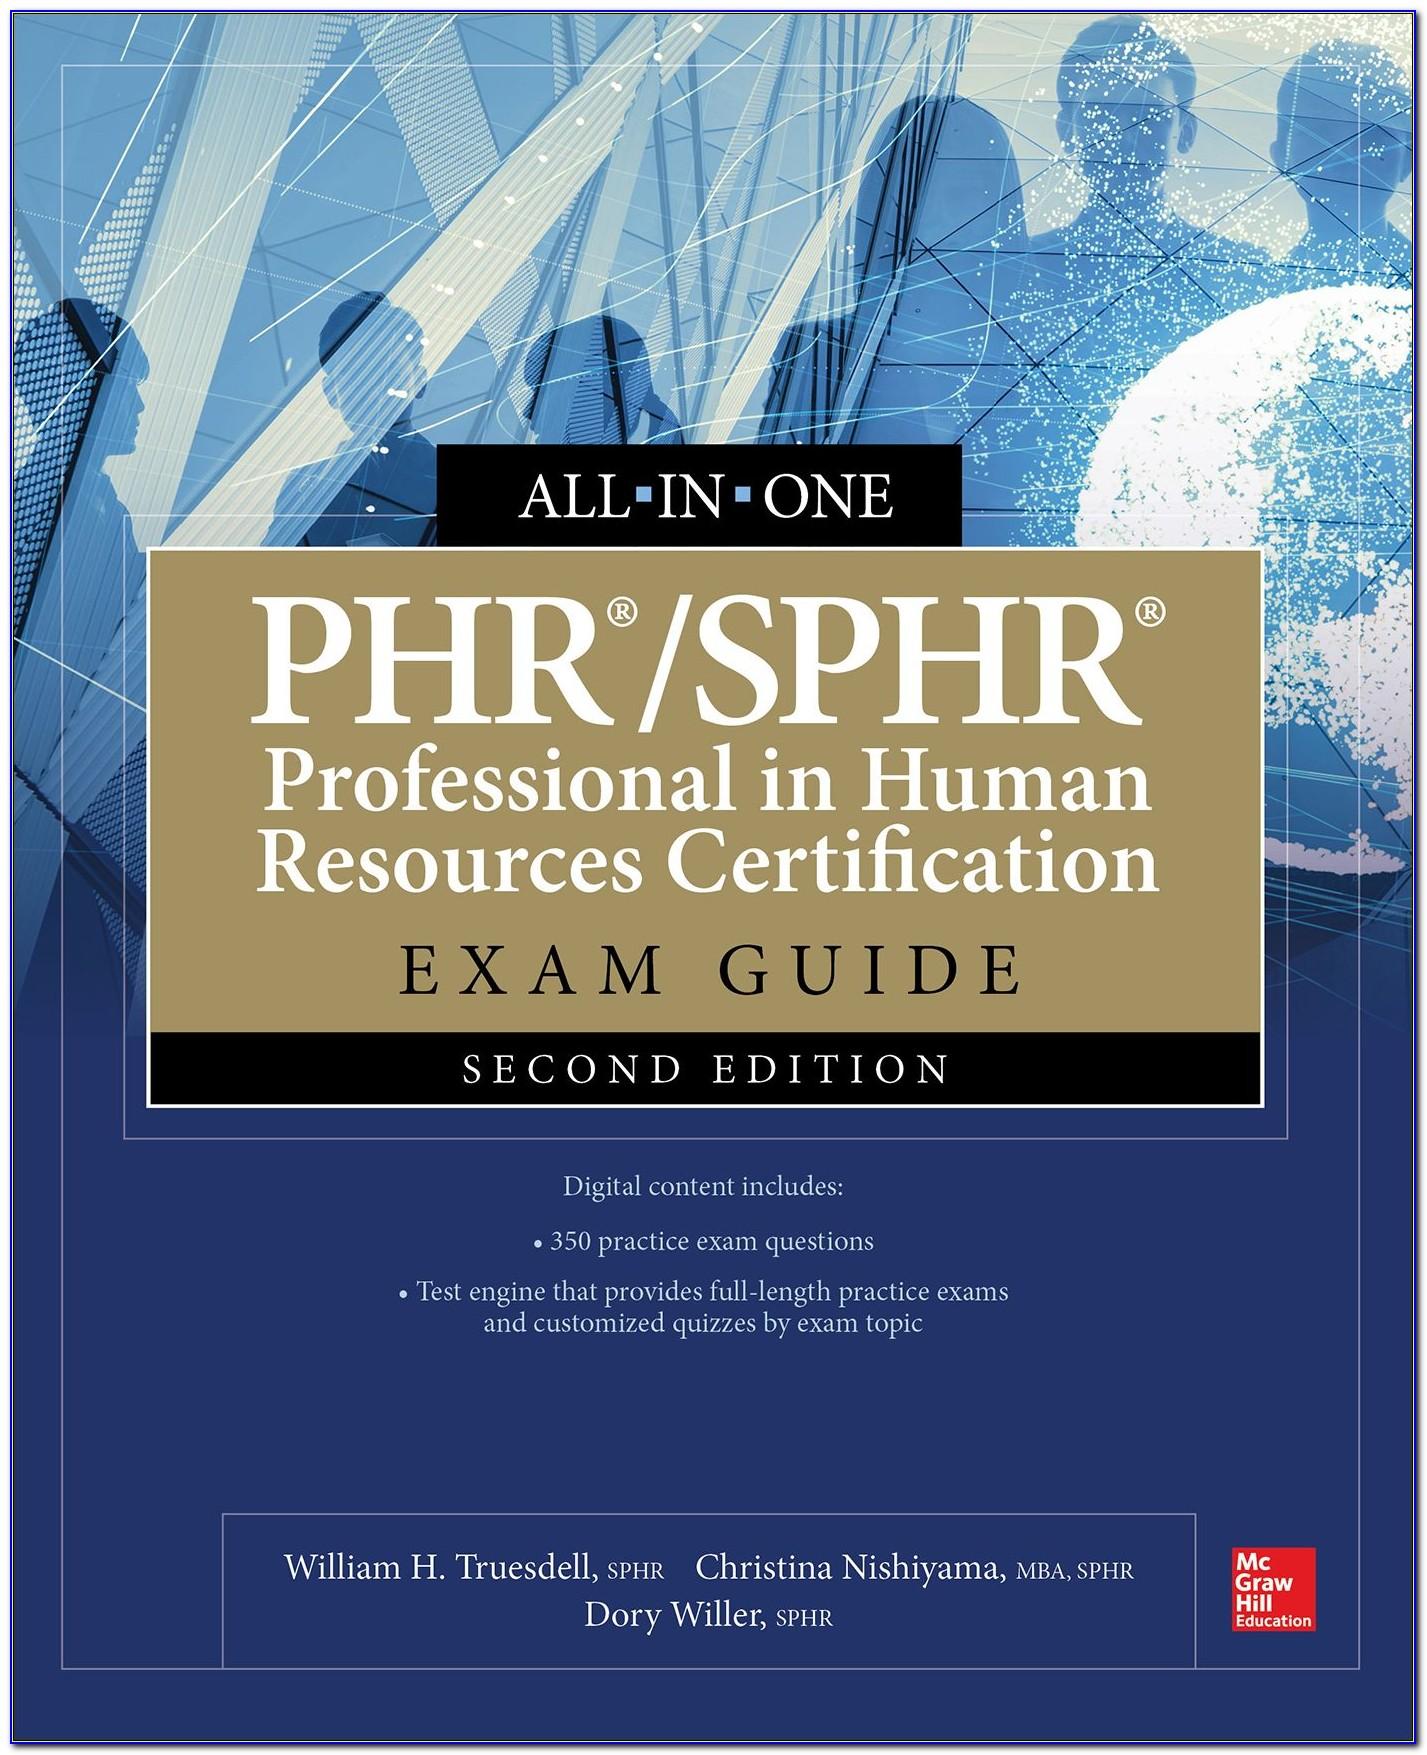 Phr Sphr Certification Preparation Course Online